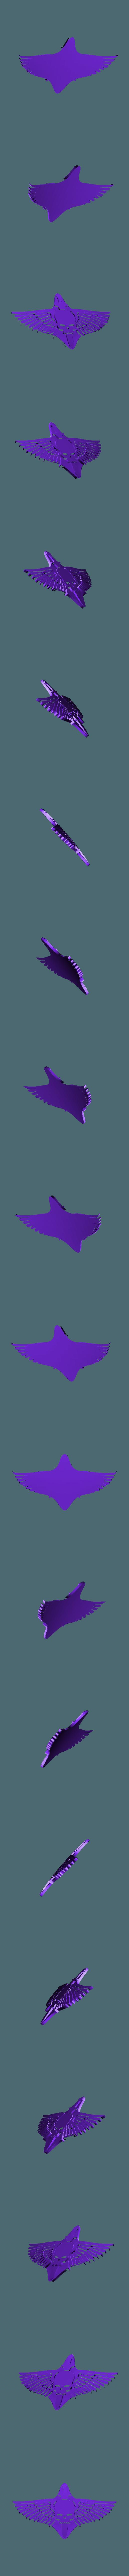 ADEPTUS_ASTARTES_SYMBOL.stl Download free STL file Logo Pack - Carapace • Design to 3D print, yaemhay